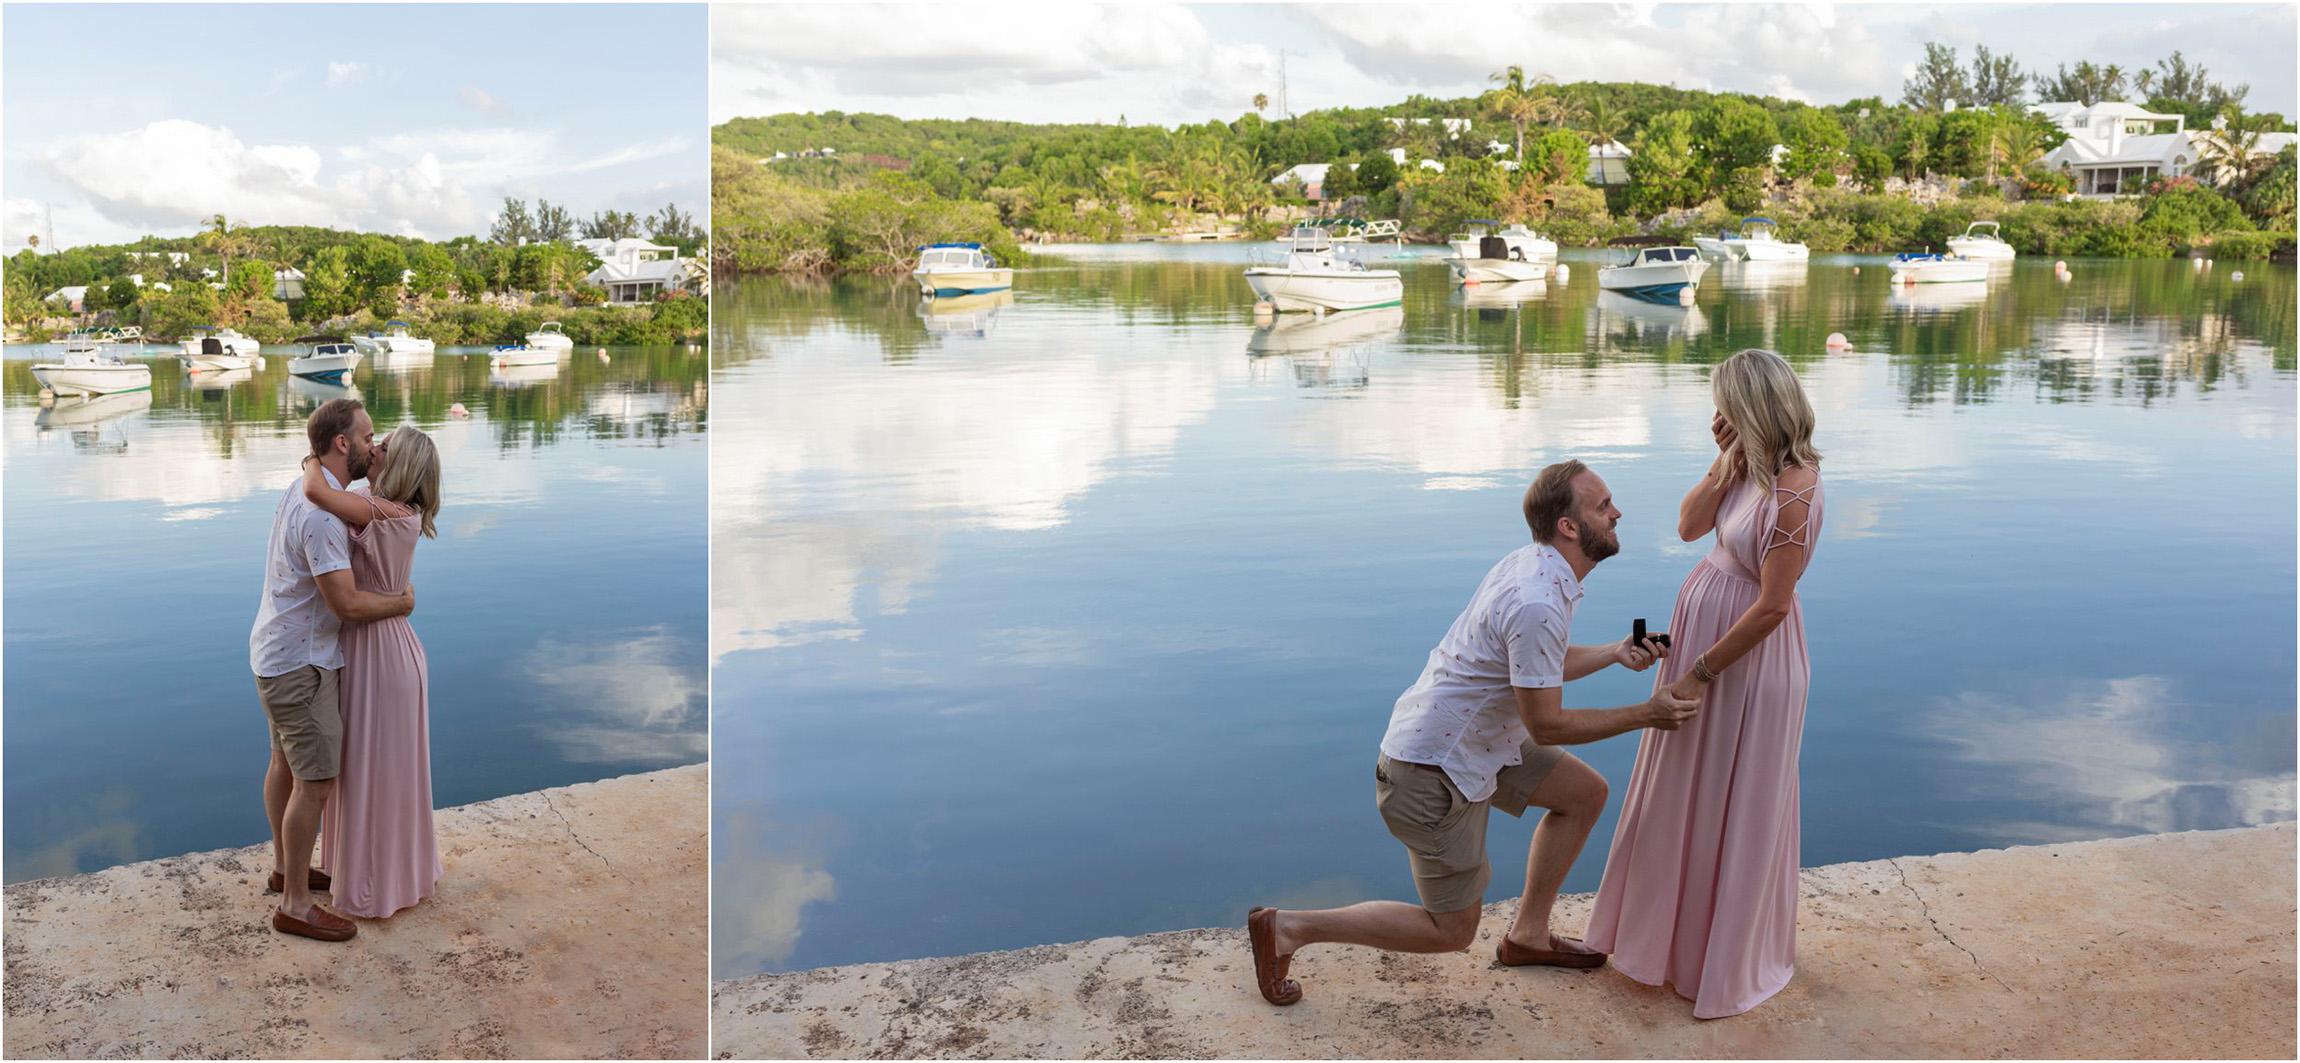 ©FianderFoto_Bermuda_Tom Moore's Jungle_Proposal Maternity Photographer_Erika_Andy_005.jpg